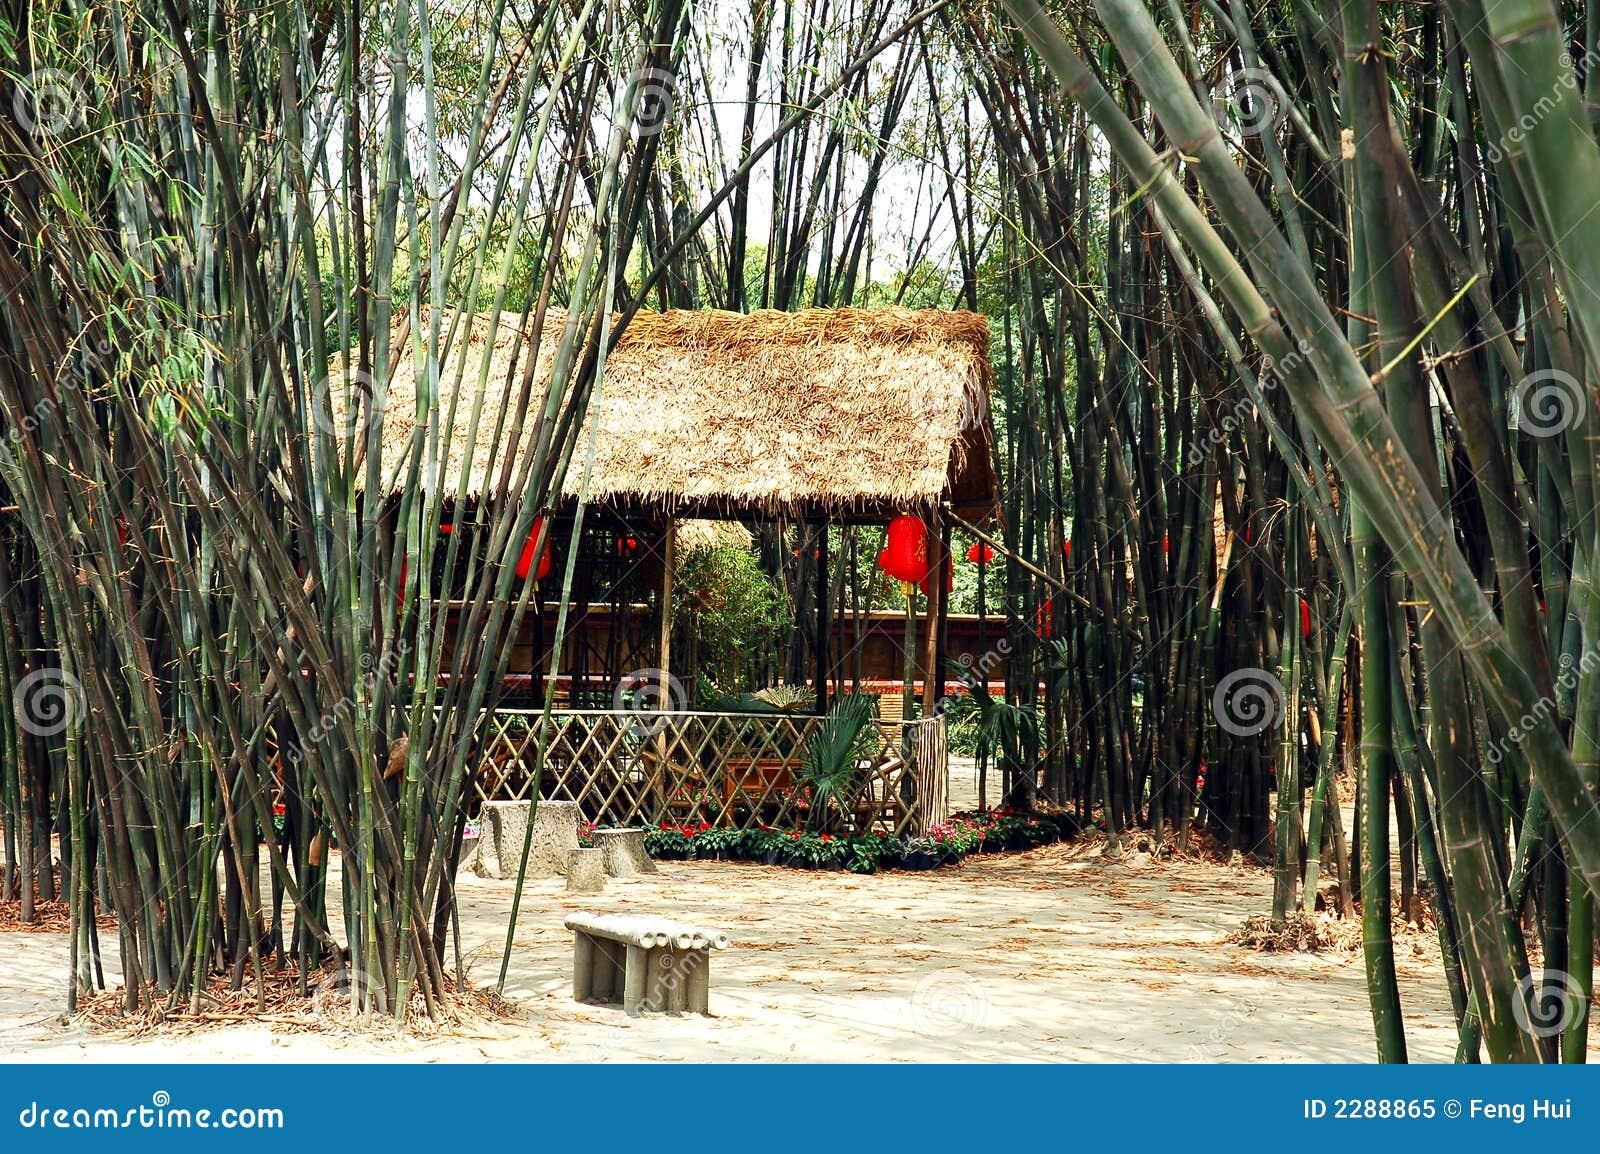 Bamboo tea house